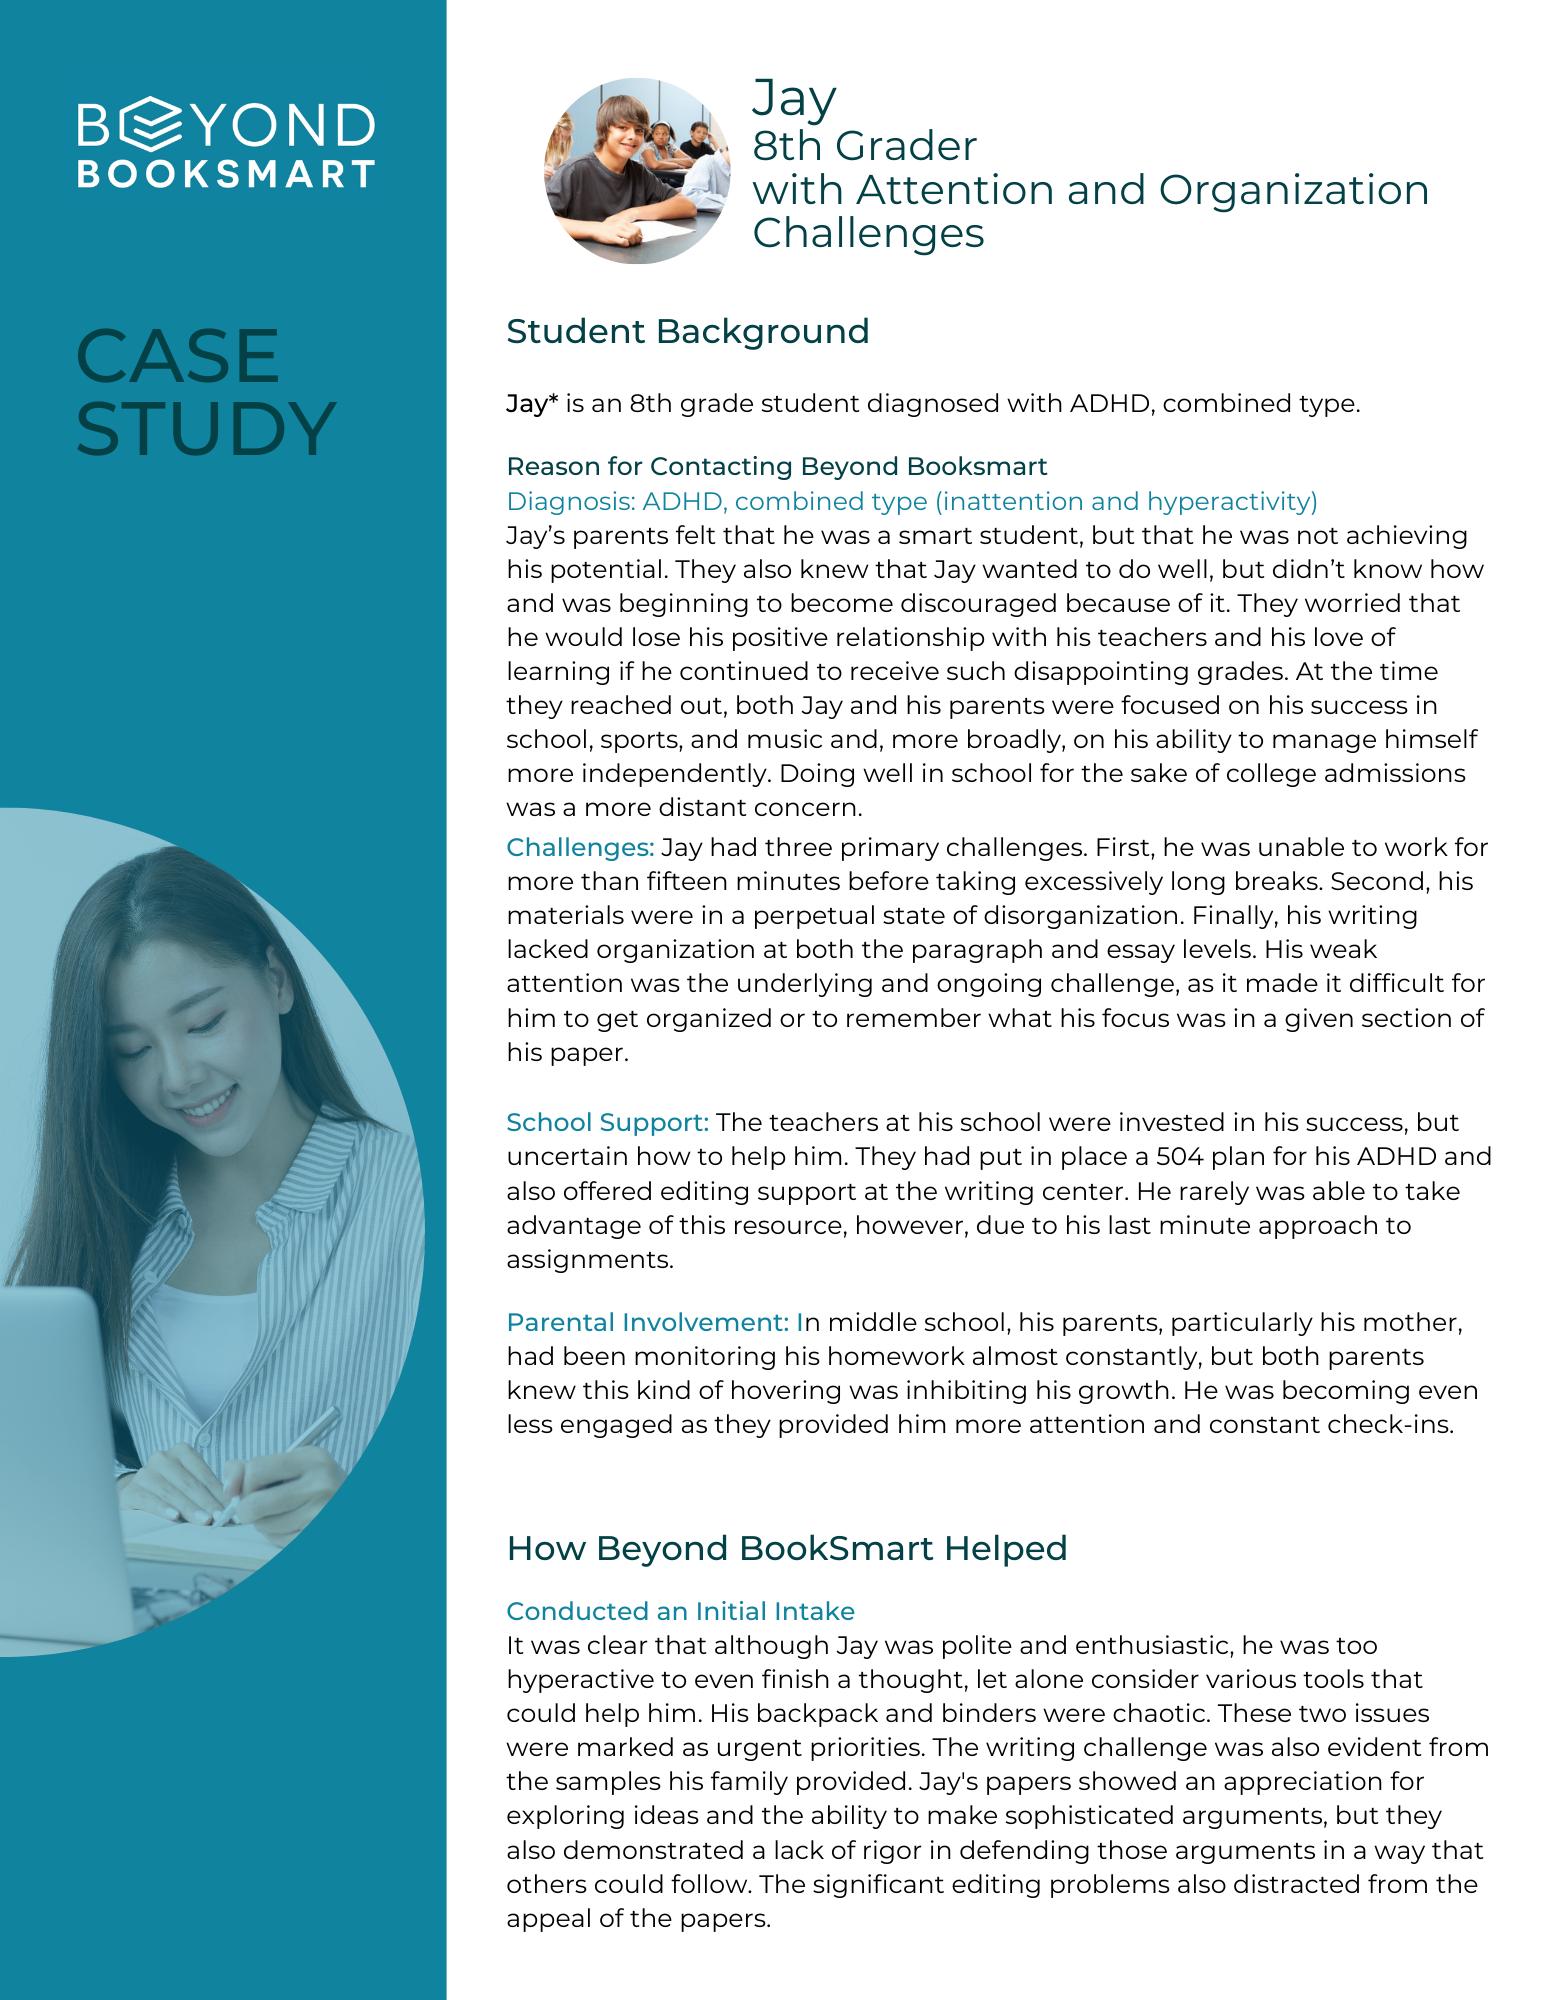 Case Study #3 Jay